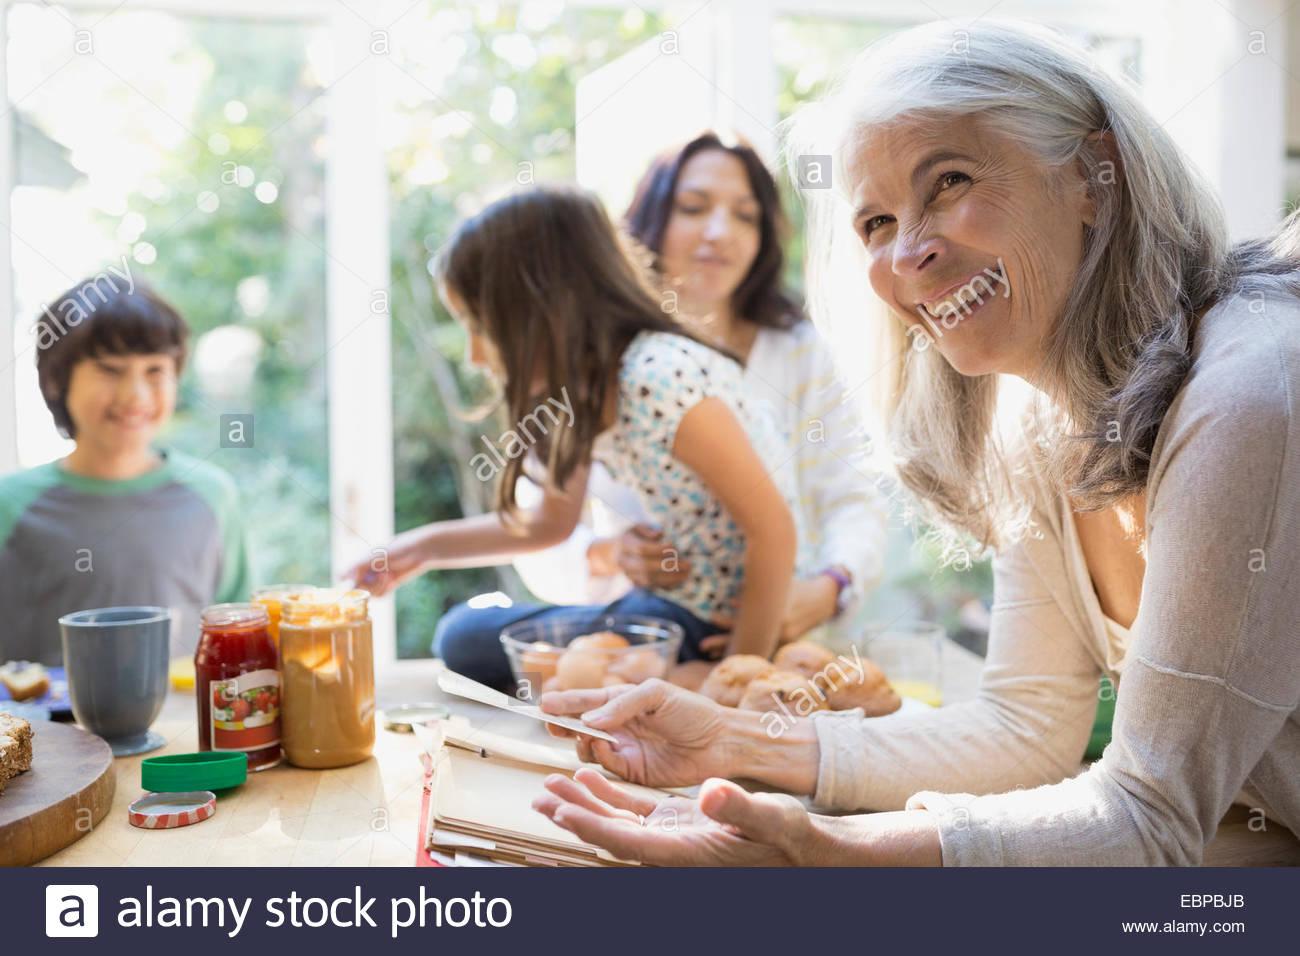 Multi-generation family in kitchen - Stock Image